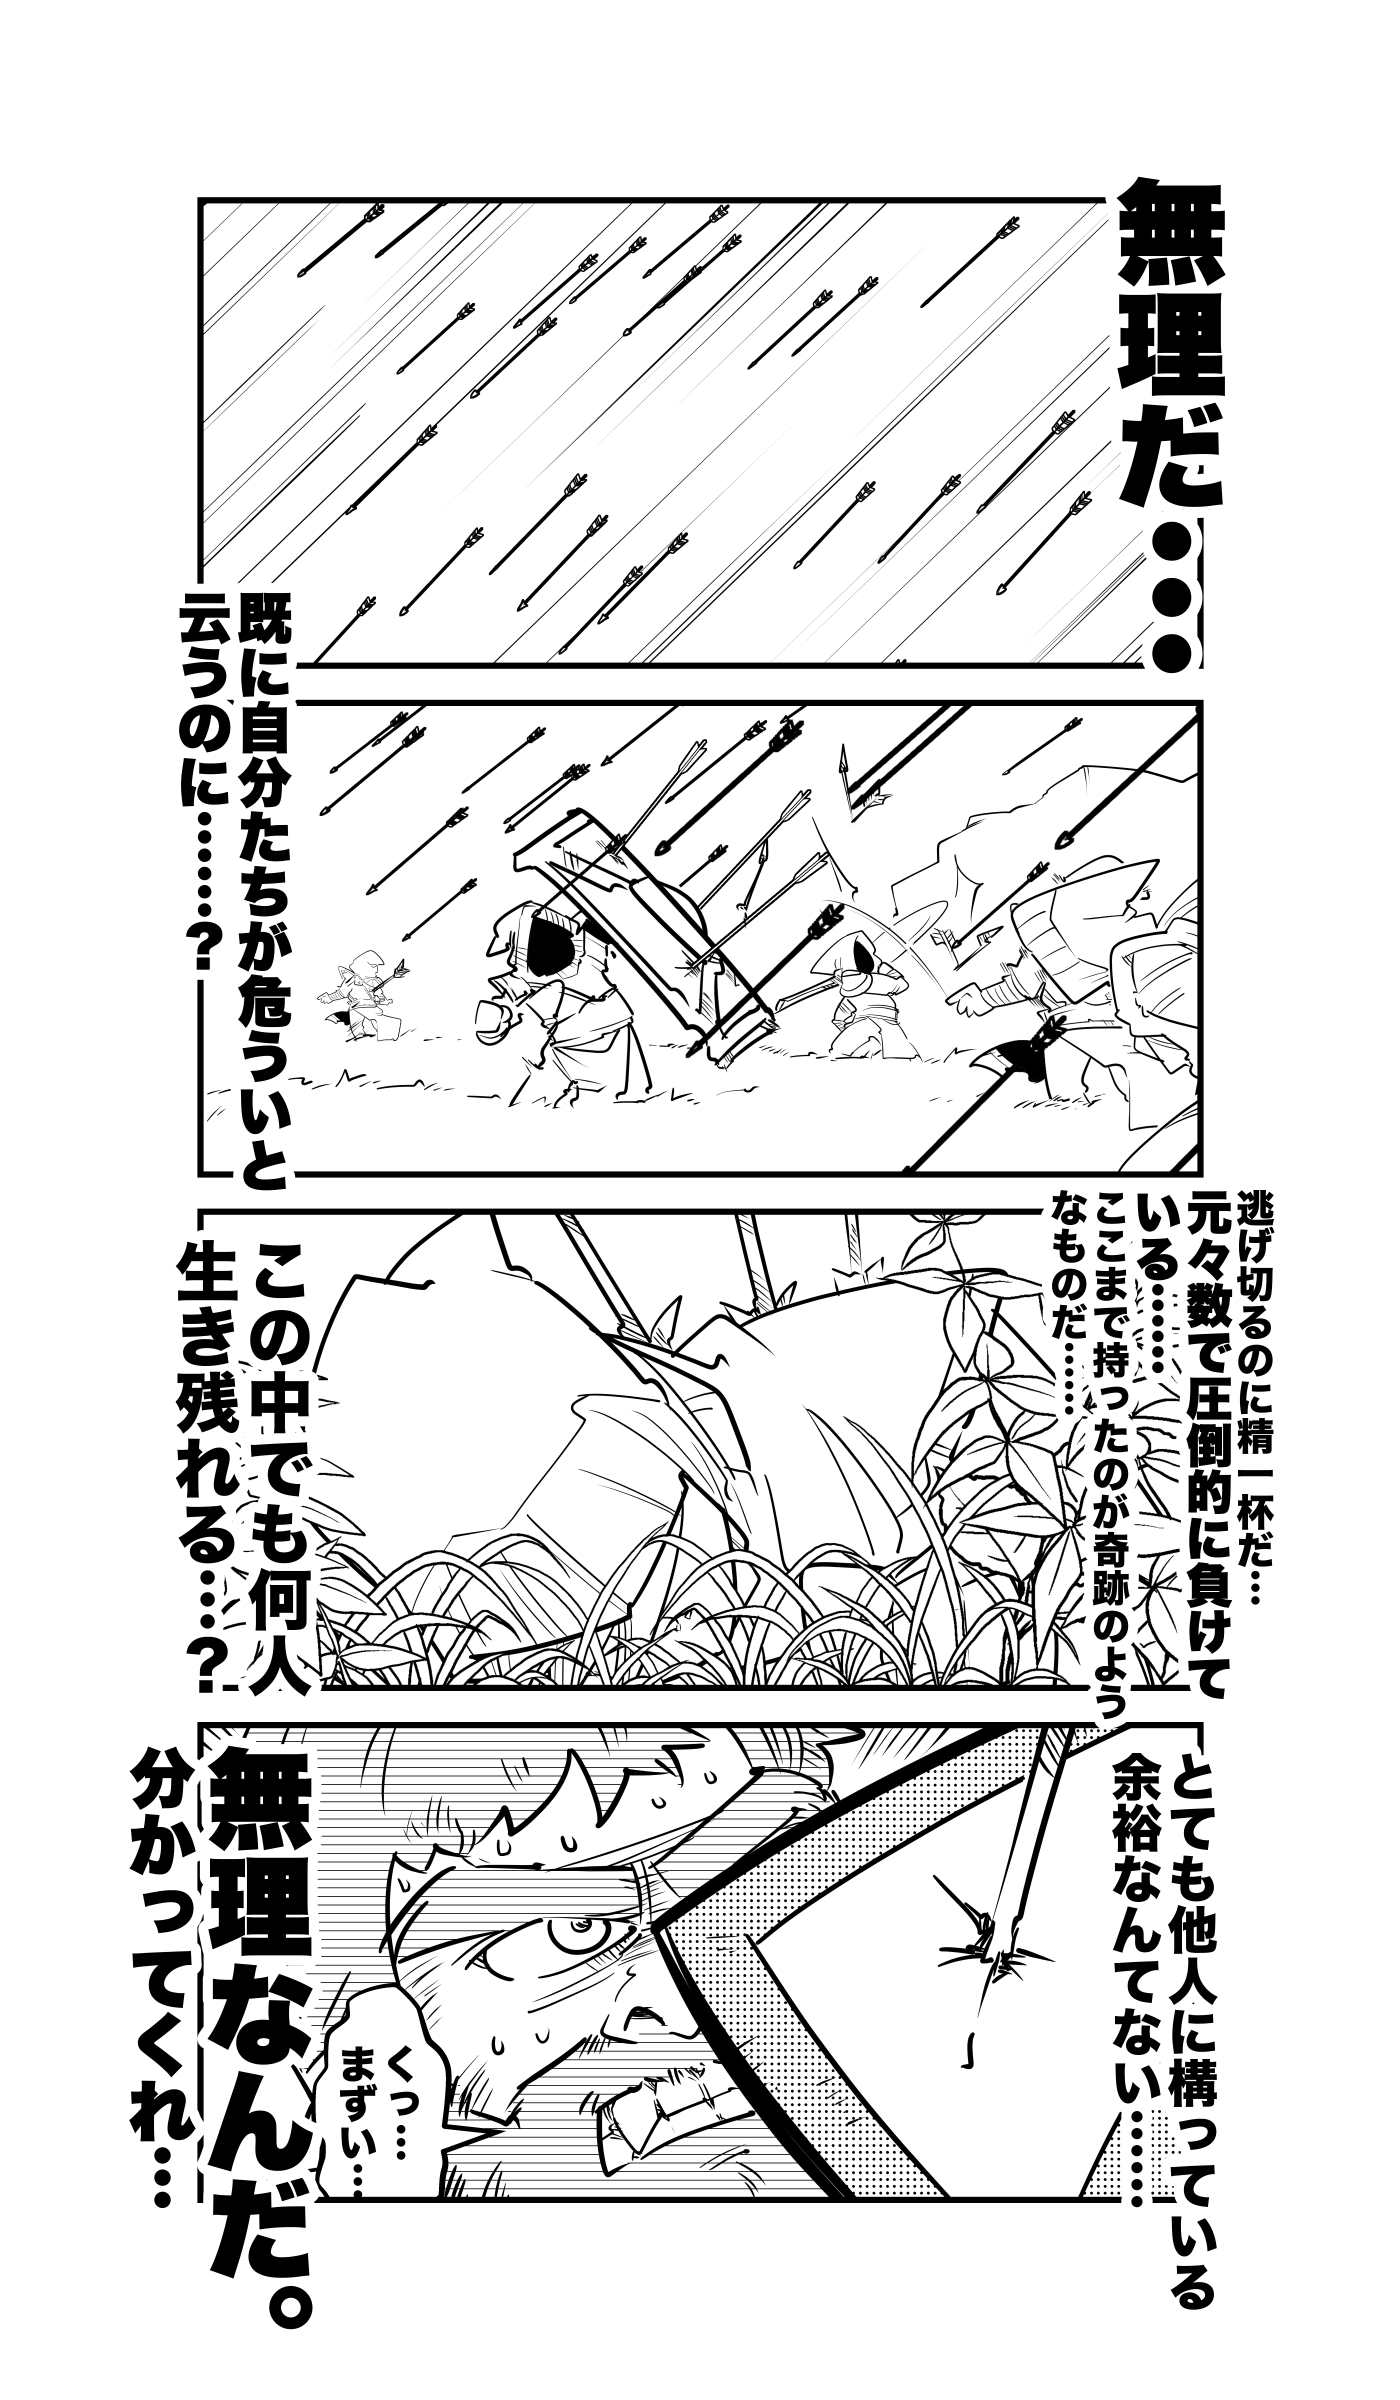 f:id:terashimaru117:20210914223842p:plain